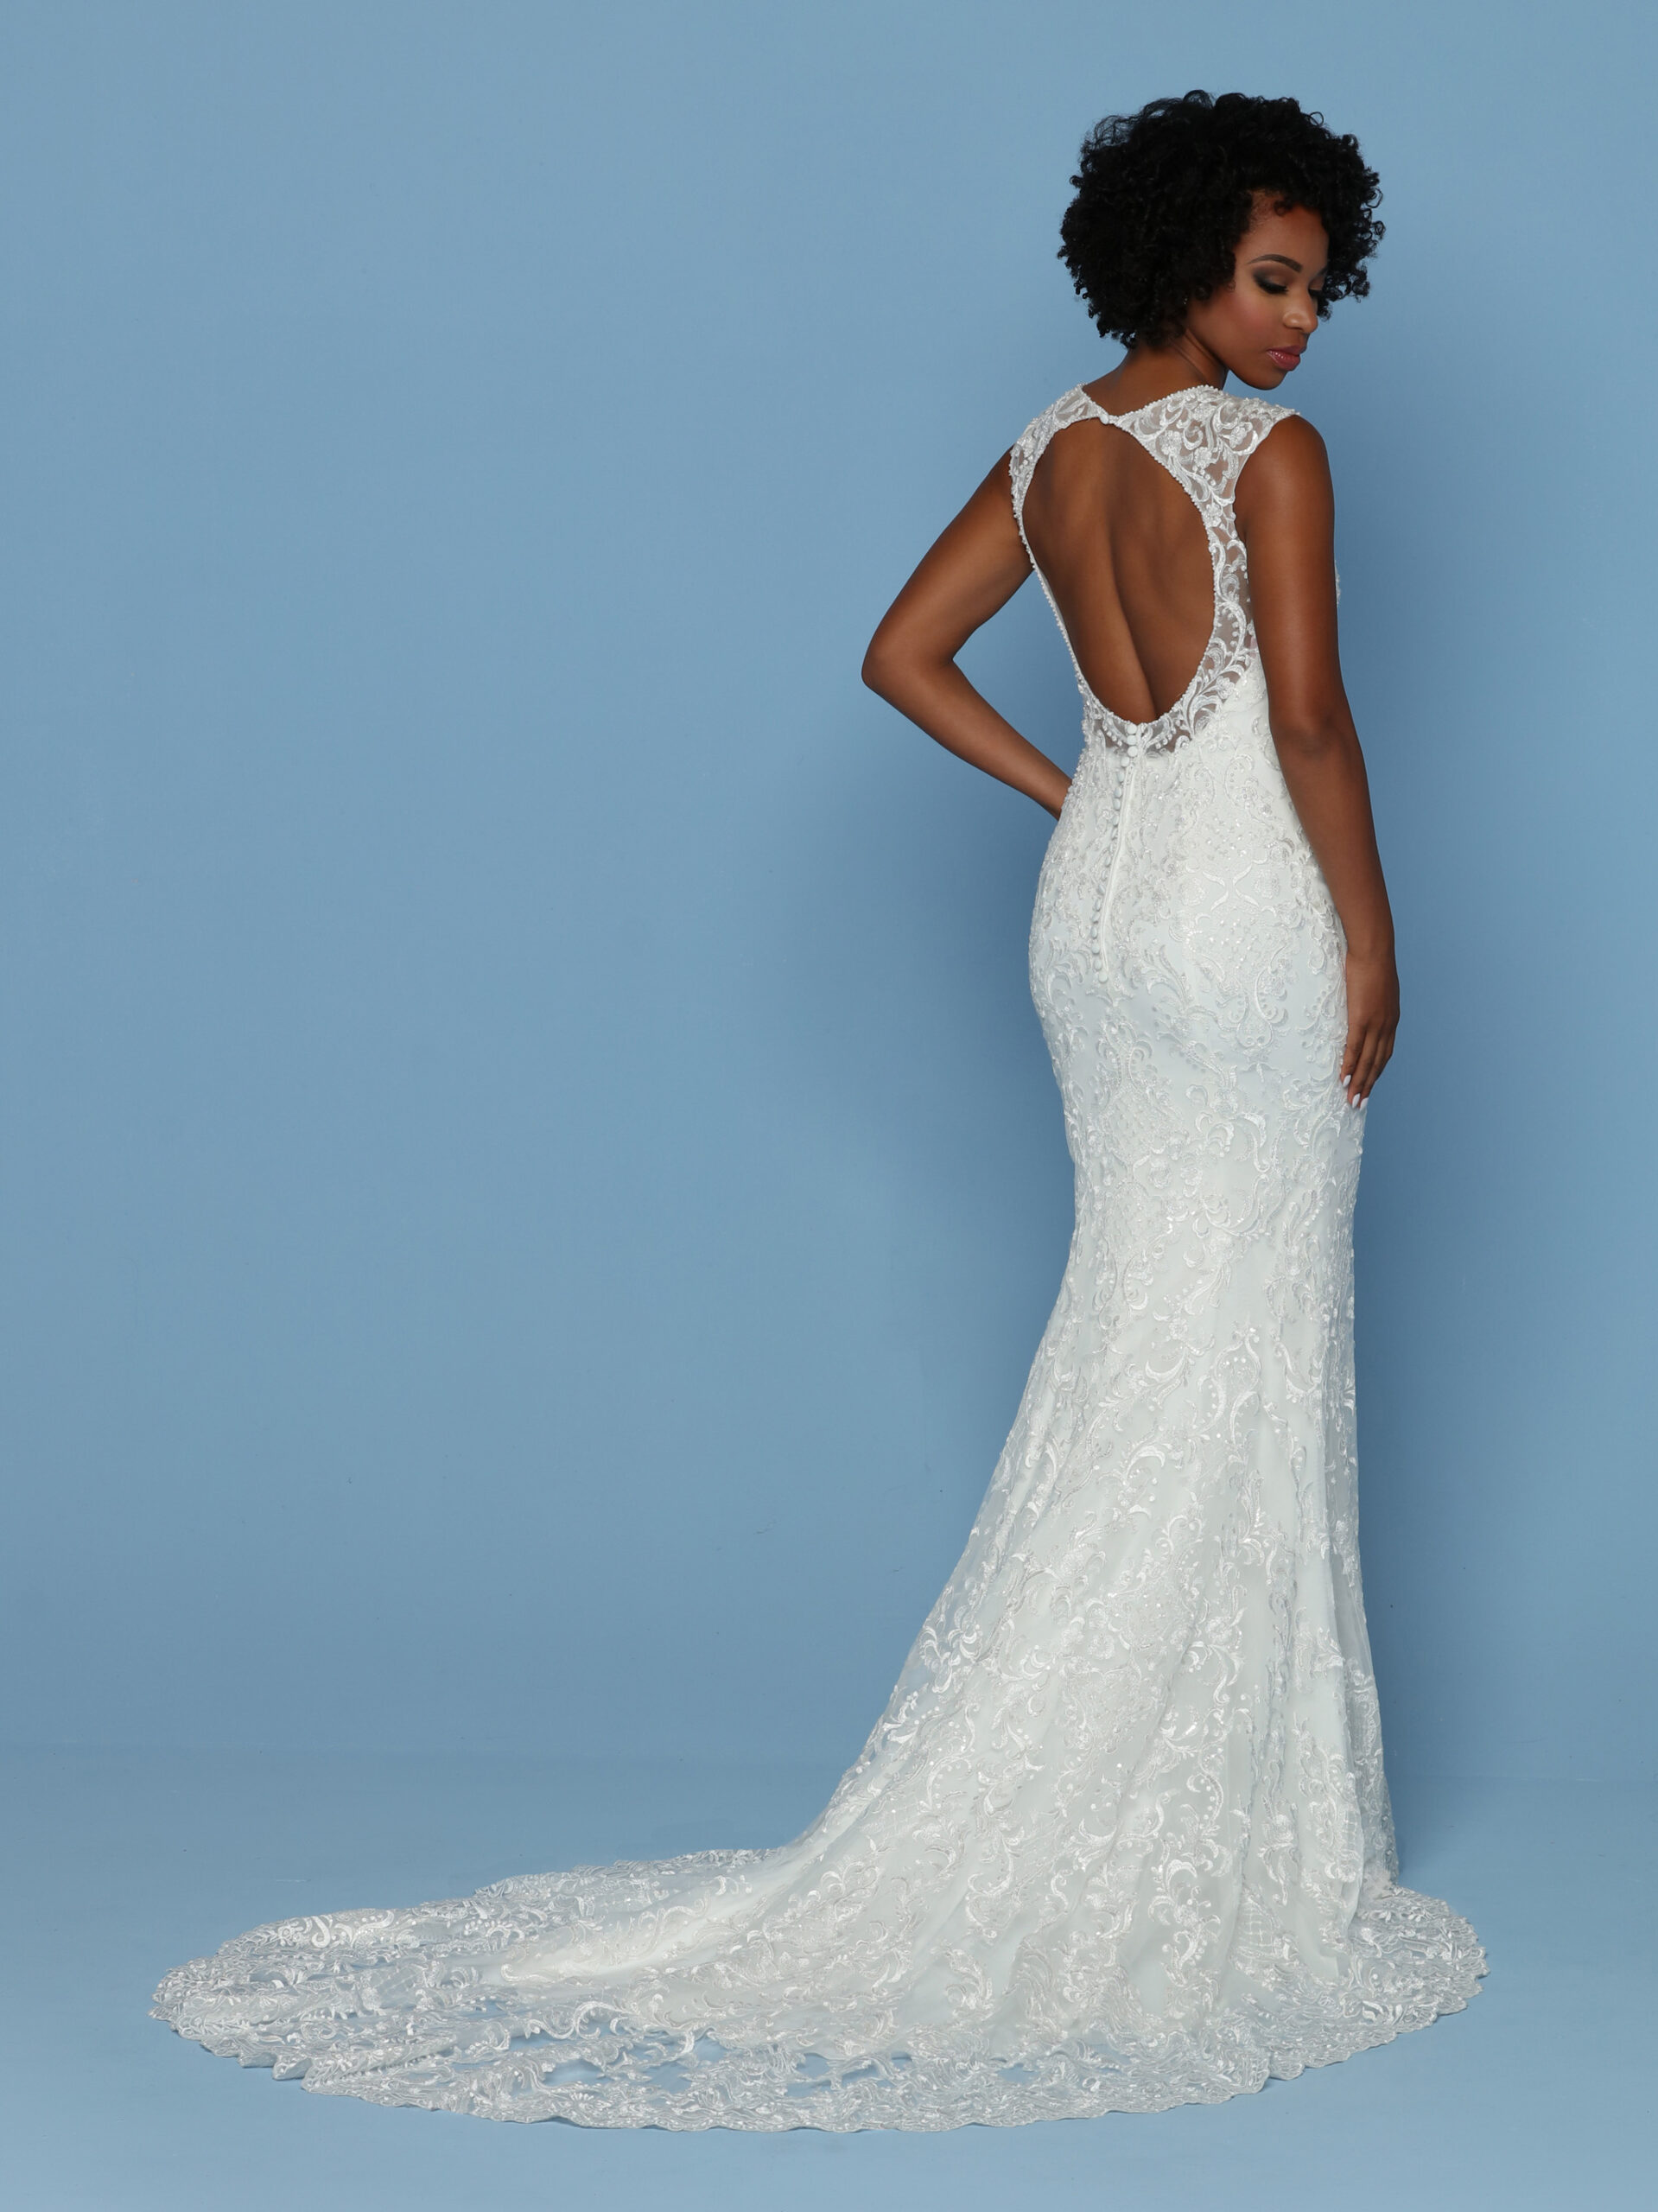 davinci-bridal-gown-02-scaled.jpg